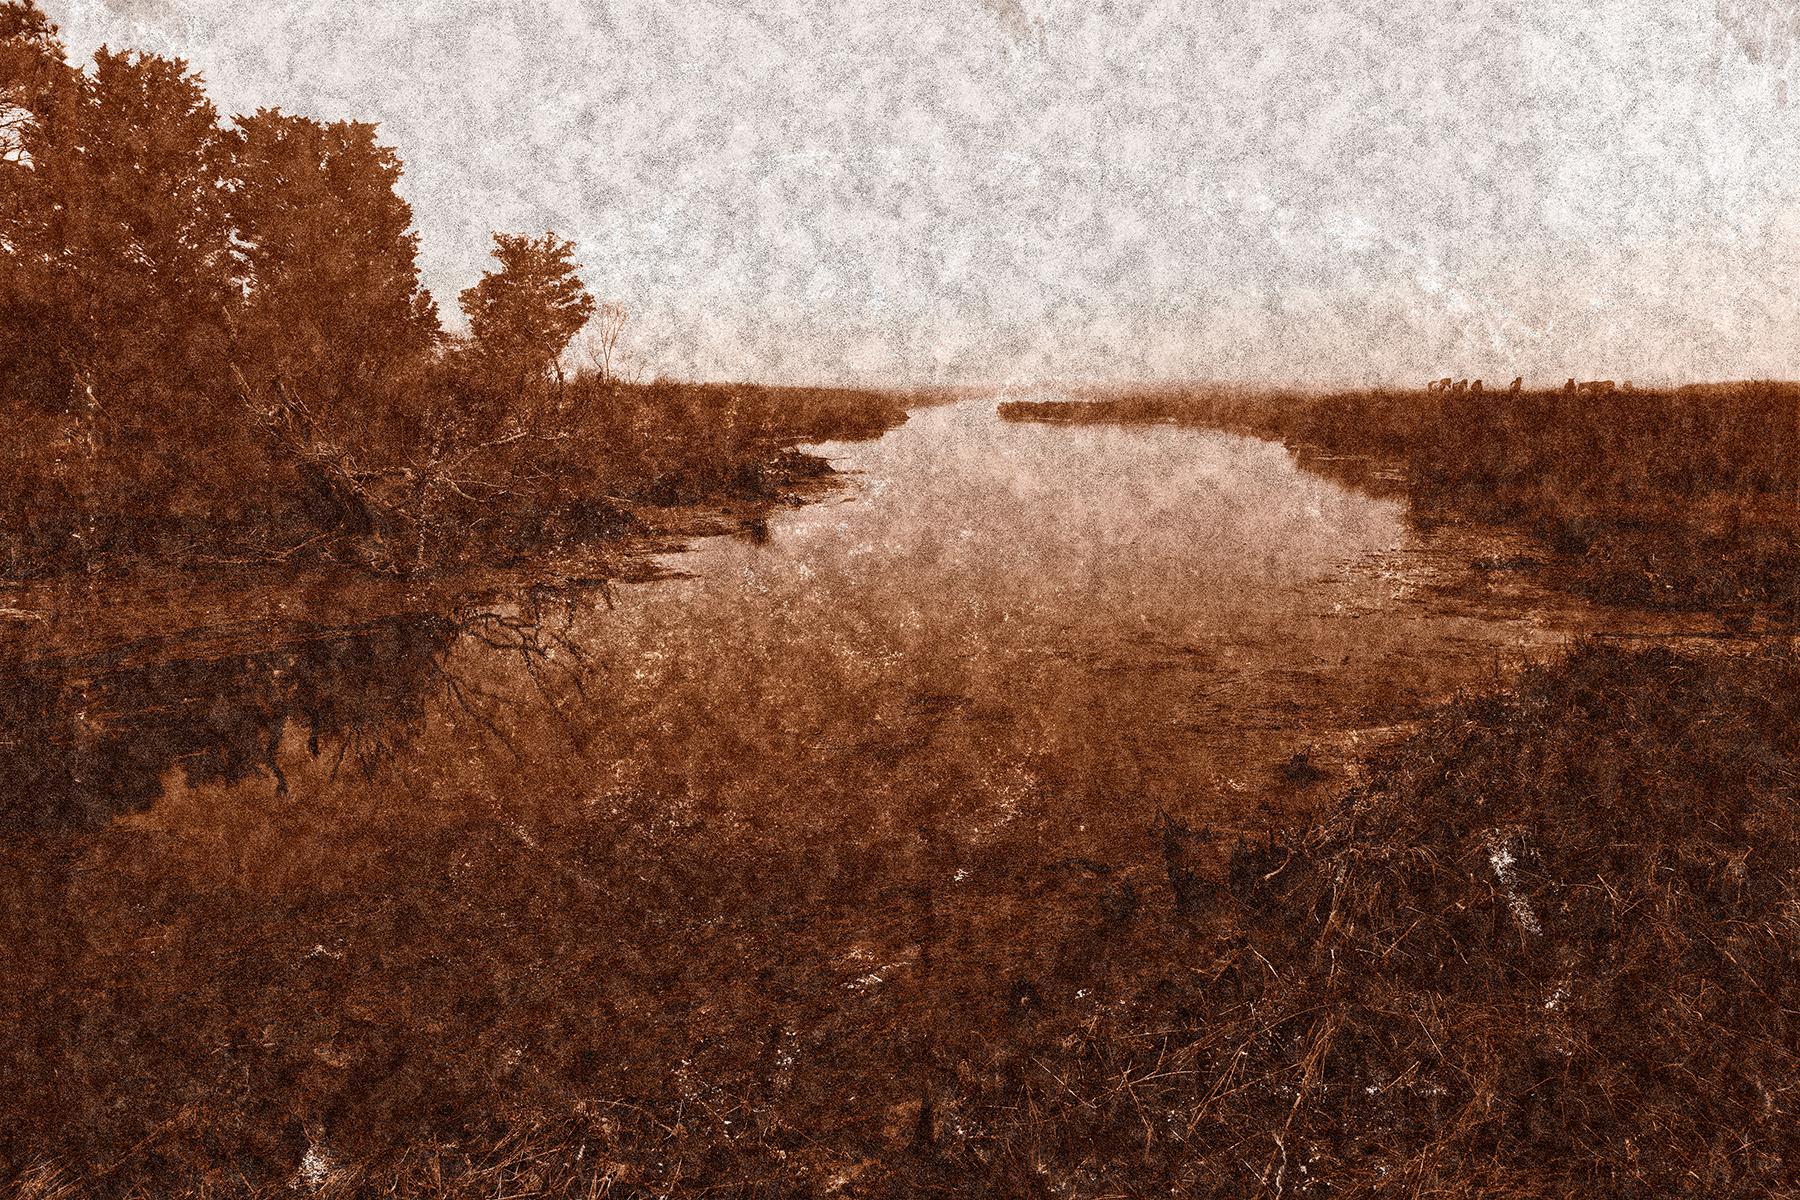 Assateague island marsh - sepia nostalgia photo